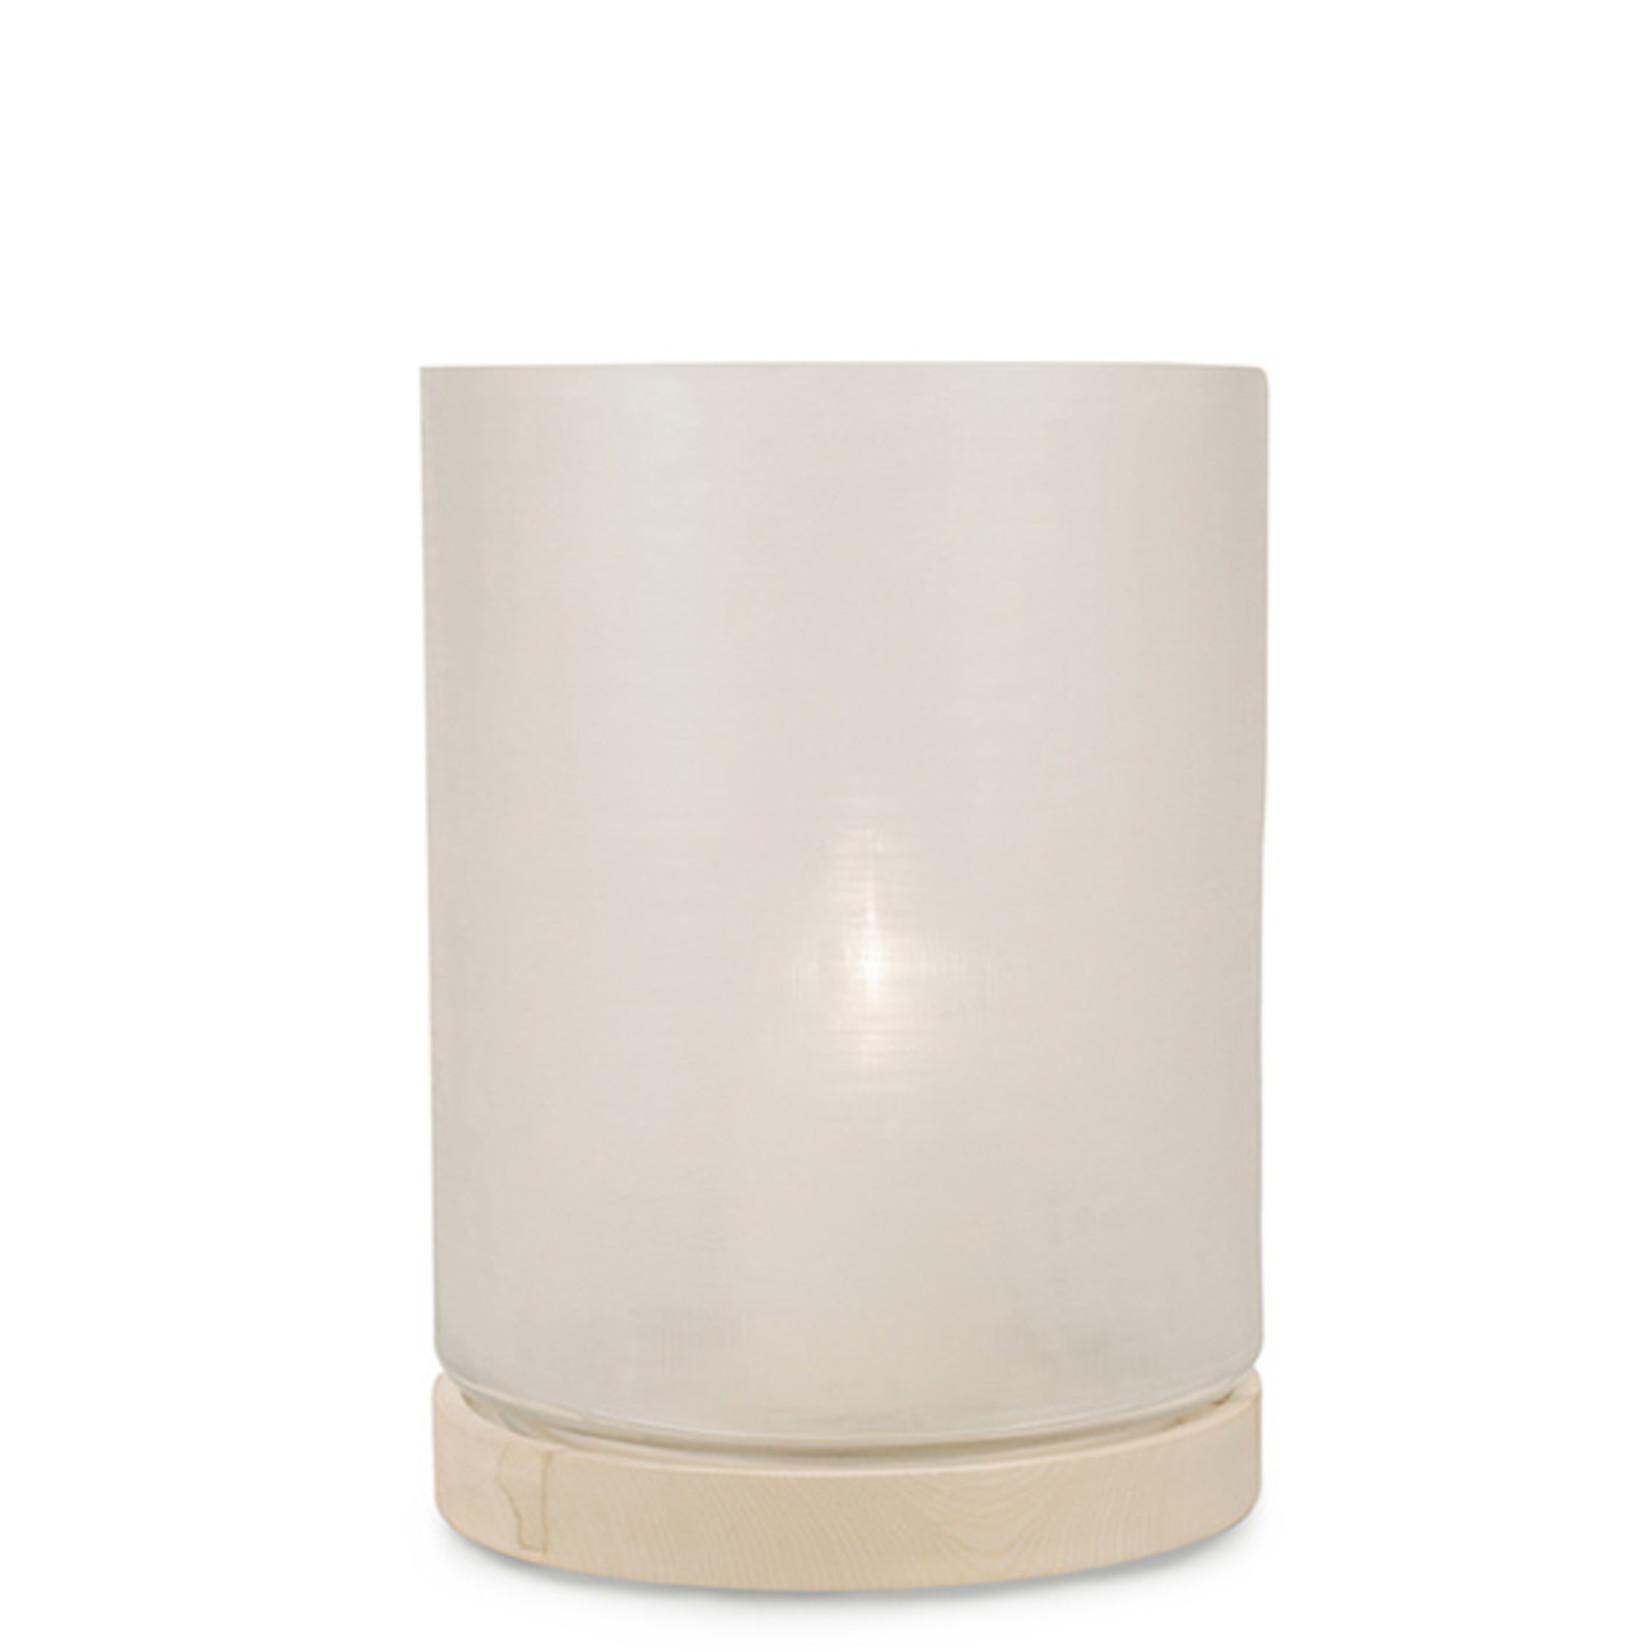 Guaxs Lantern Aran XL   Clear / Sycamore